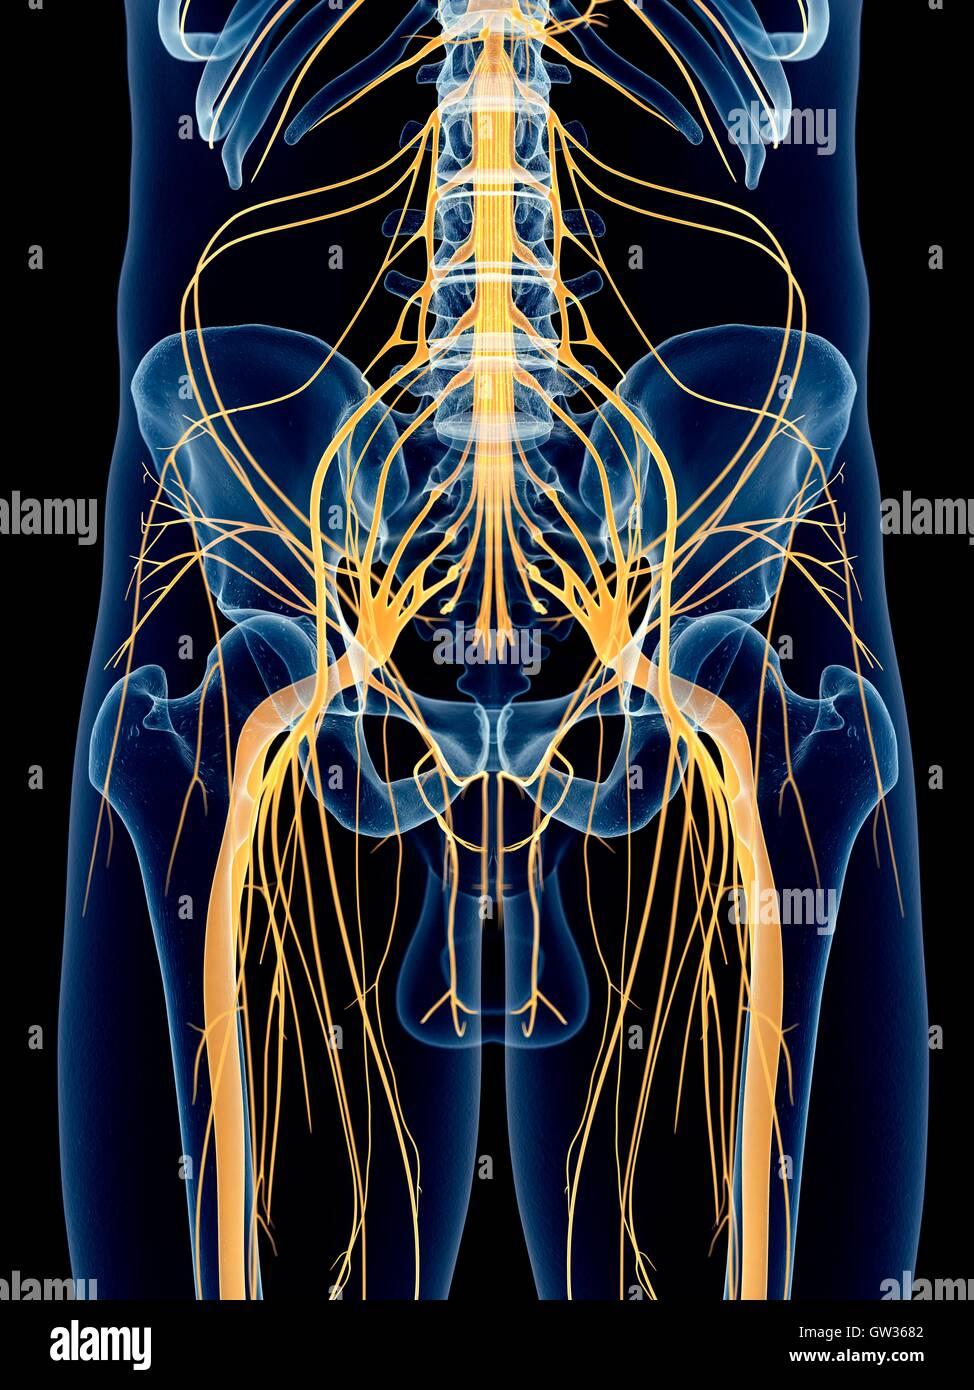 Human sciatic nerve, illustration Stock Photo: 118699394 - Alamy